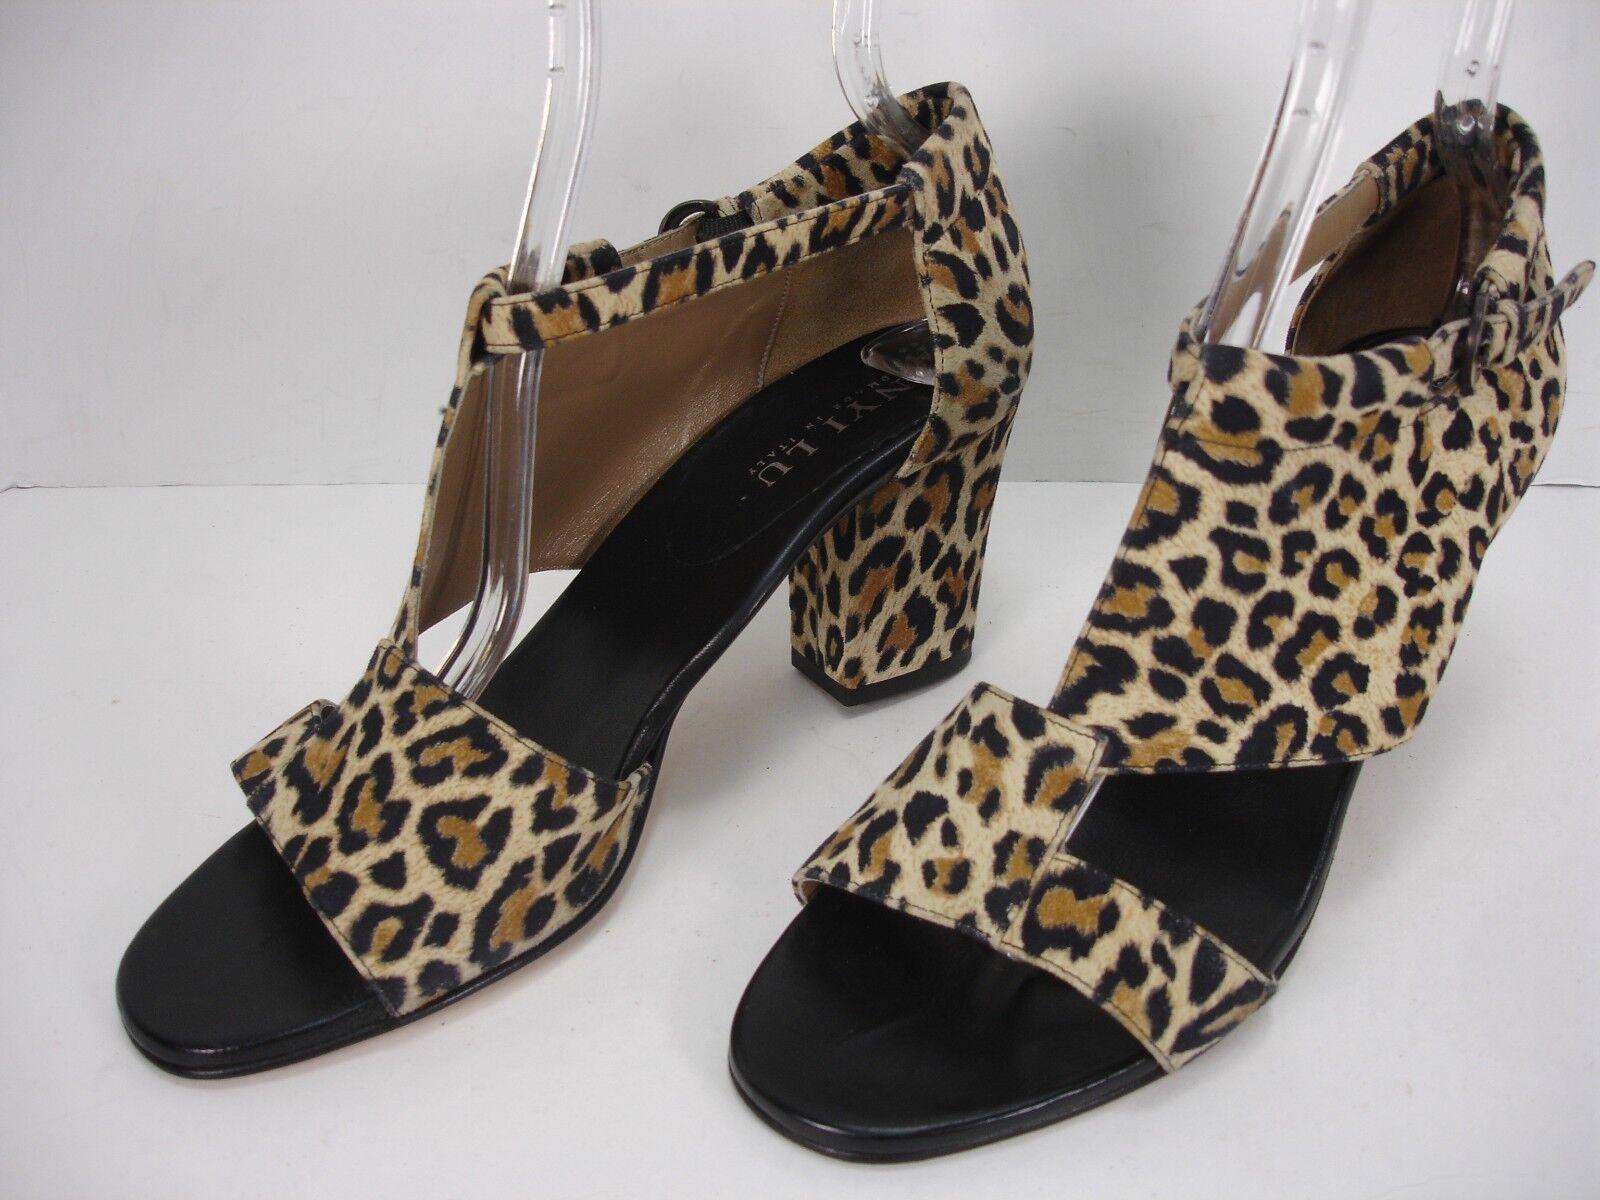 ANYI LU ELECTRA NUBUCK SUEDE LEOPARD PRINT OPEN TOE SANDALS chaussures femmes 39.5